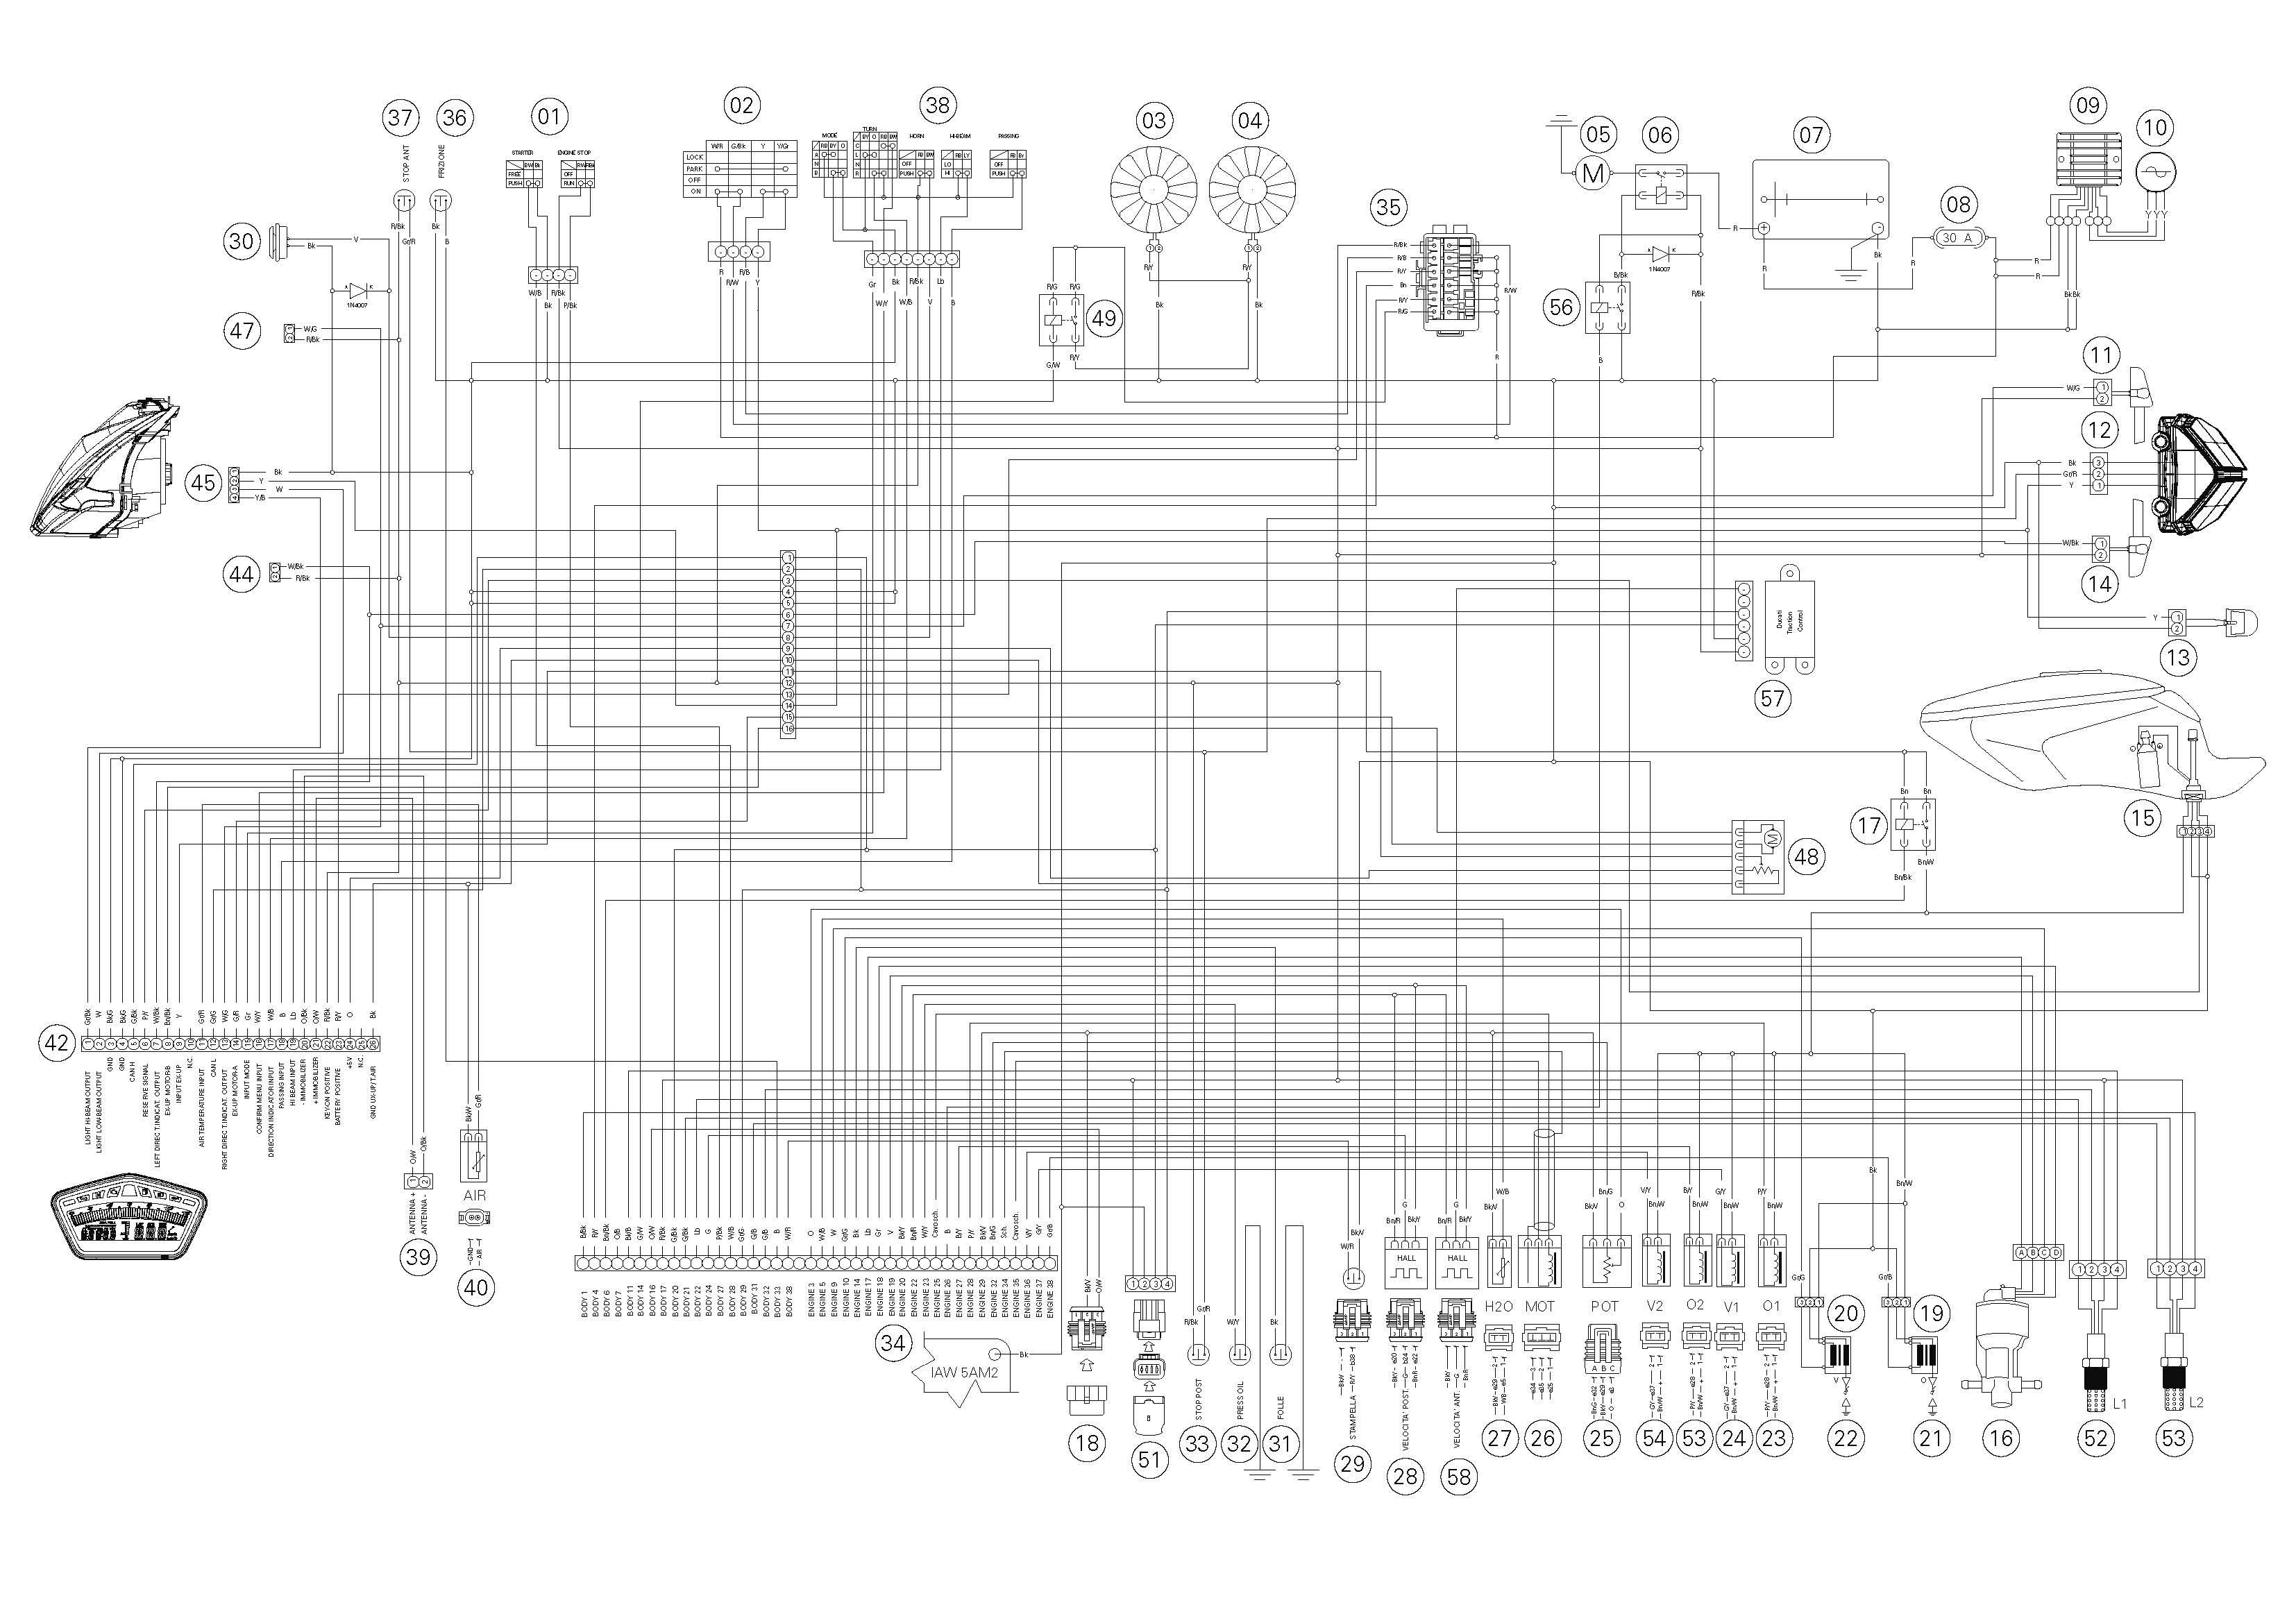 wire diagram for a streetfighter | ducati.ms - the ultimate ducati forum  ducati.ms